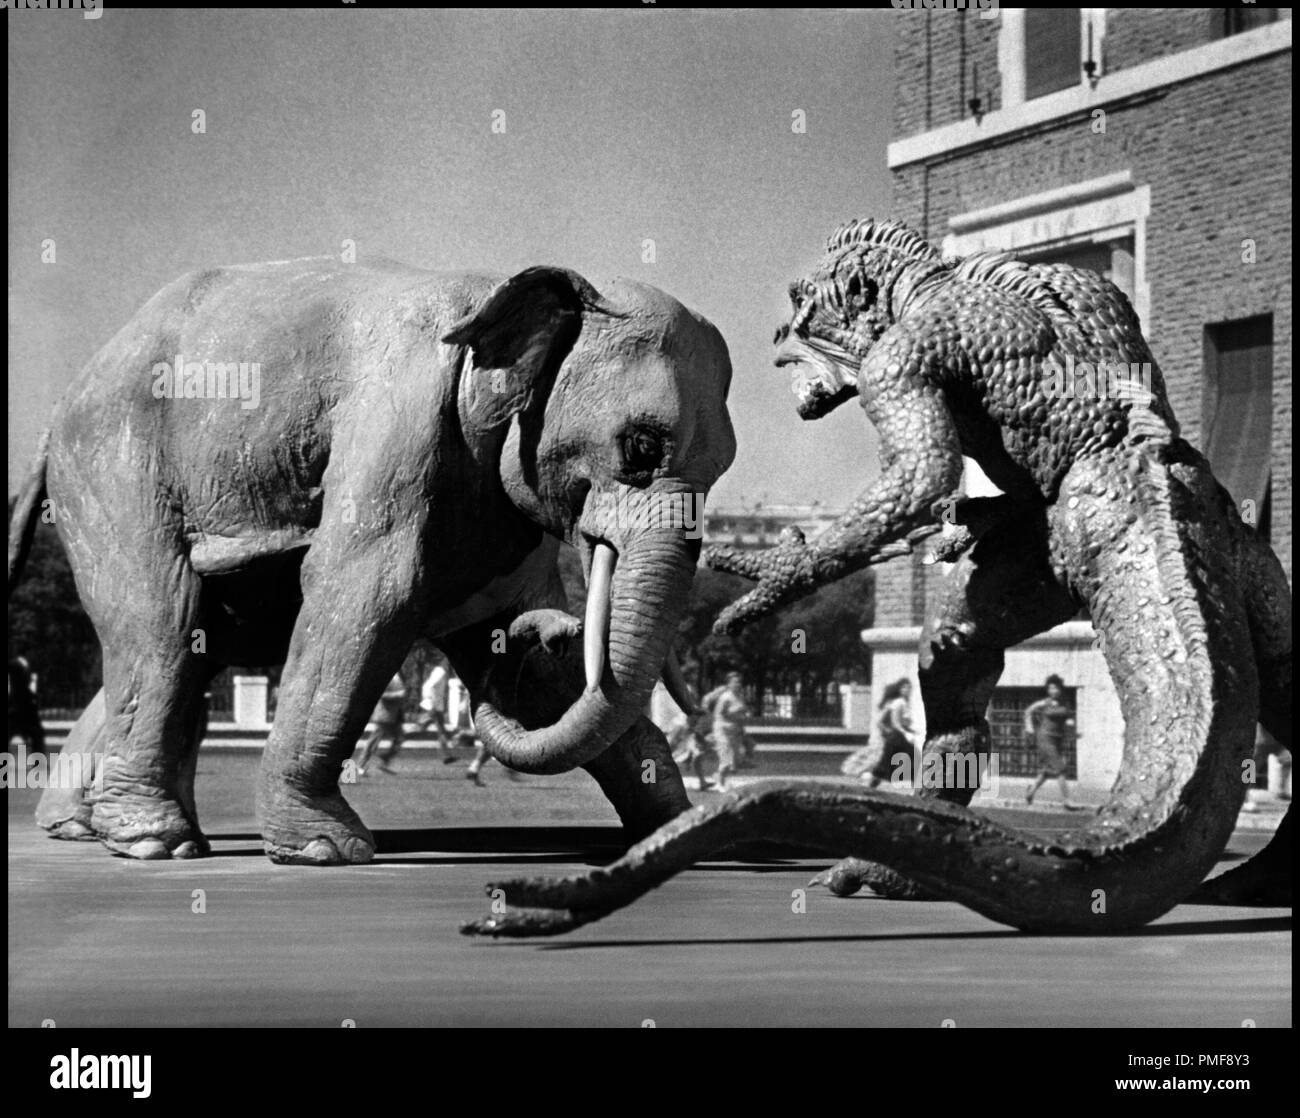 Prod DB © Morningside Movies / DR A DES MILLIONS DE KILOMETRES DE LA TERRE (20 MILLION MILES TO EARTH)  de Nathan Juran 1957 USA science-fiction, serie B, monstre, dinosaure, ridicule, effets speciaux, elephant, combat autres titres: The Beast from Space The Giant Ymir - Stock Image